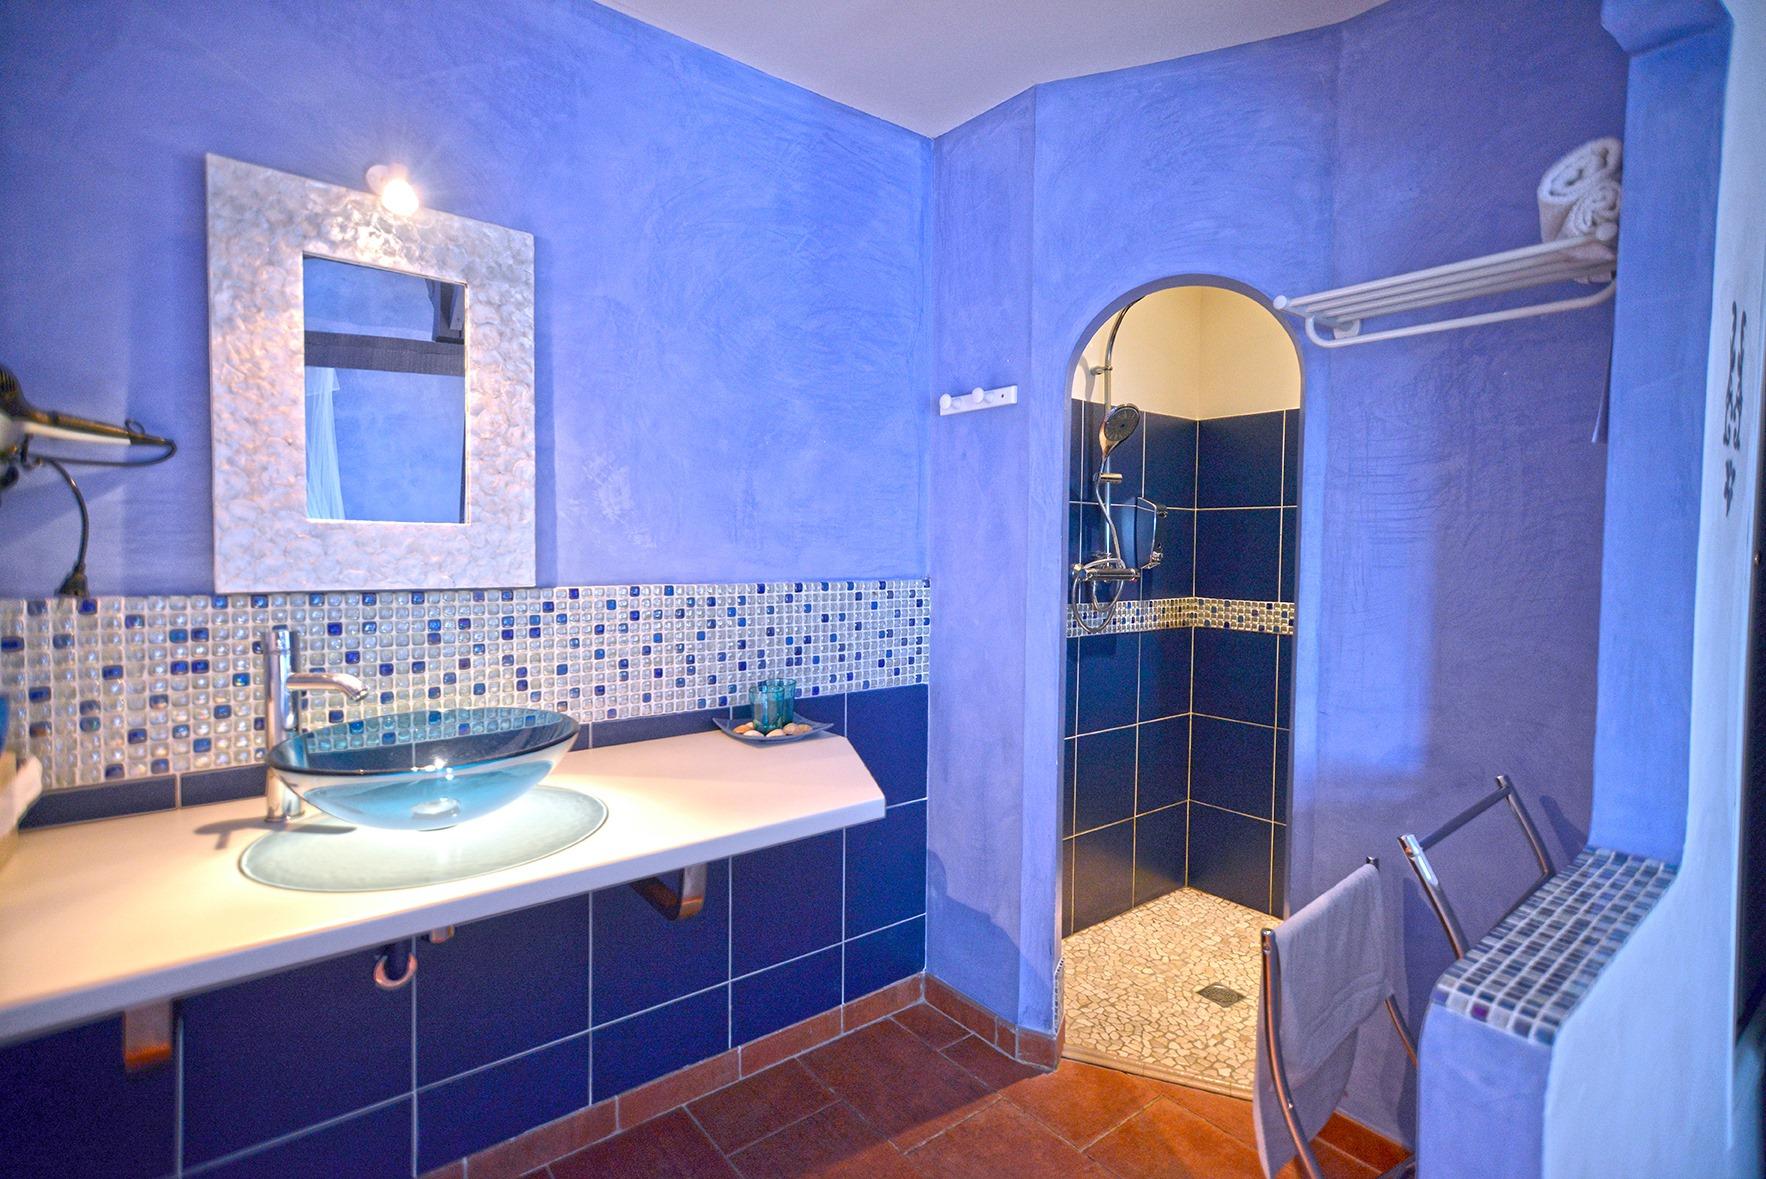 S.d'eau chambre bleu